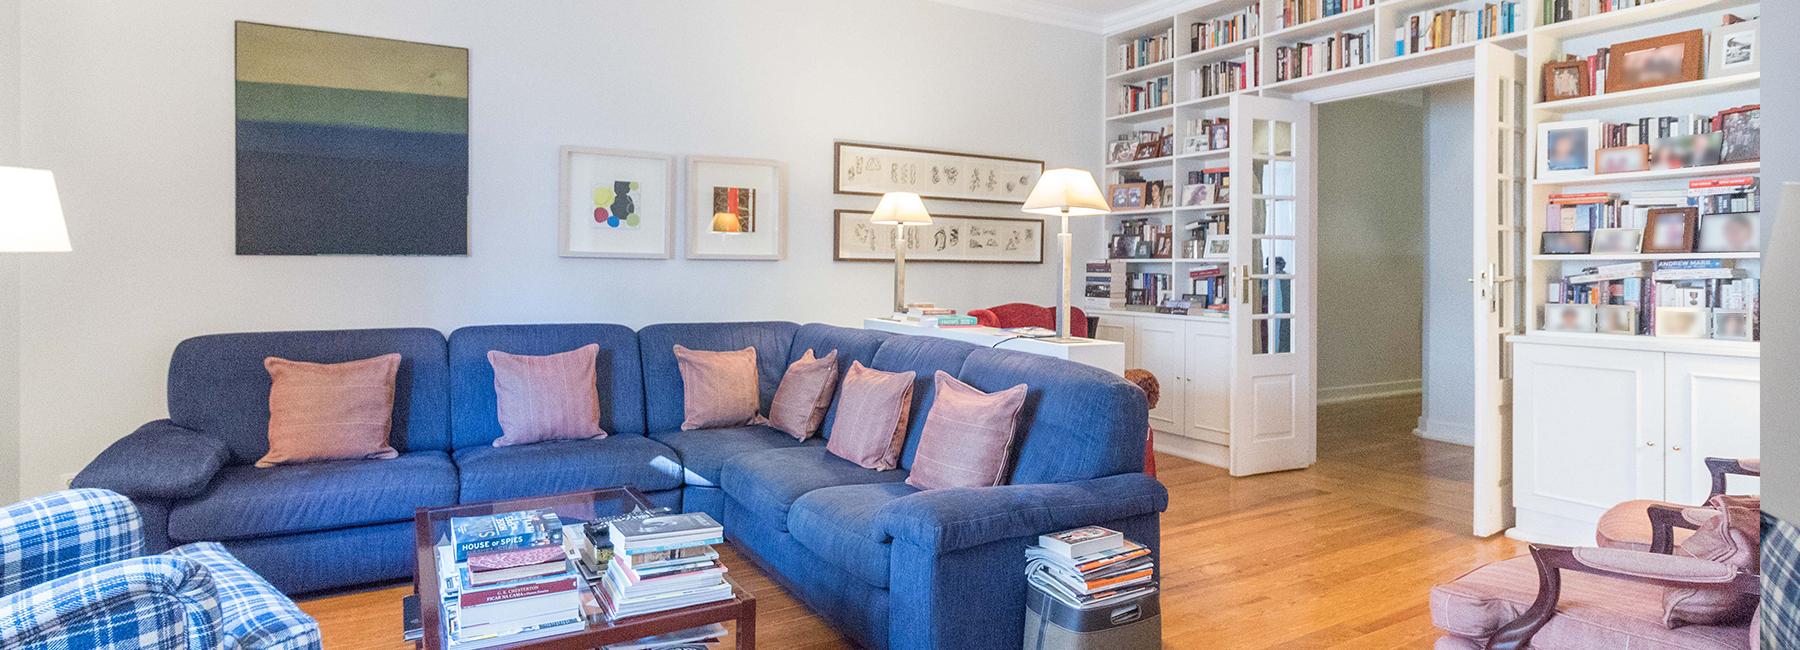 <a href='/engb/imovel/apartamento-t4-no-marques-de-pombal-lisboa/?rid=7230245' target=''>Av. Liberdade - 4-Bedroom apartment</a>